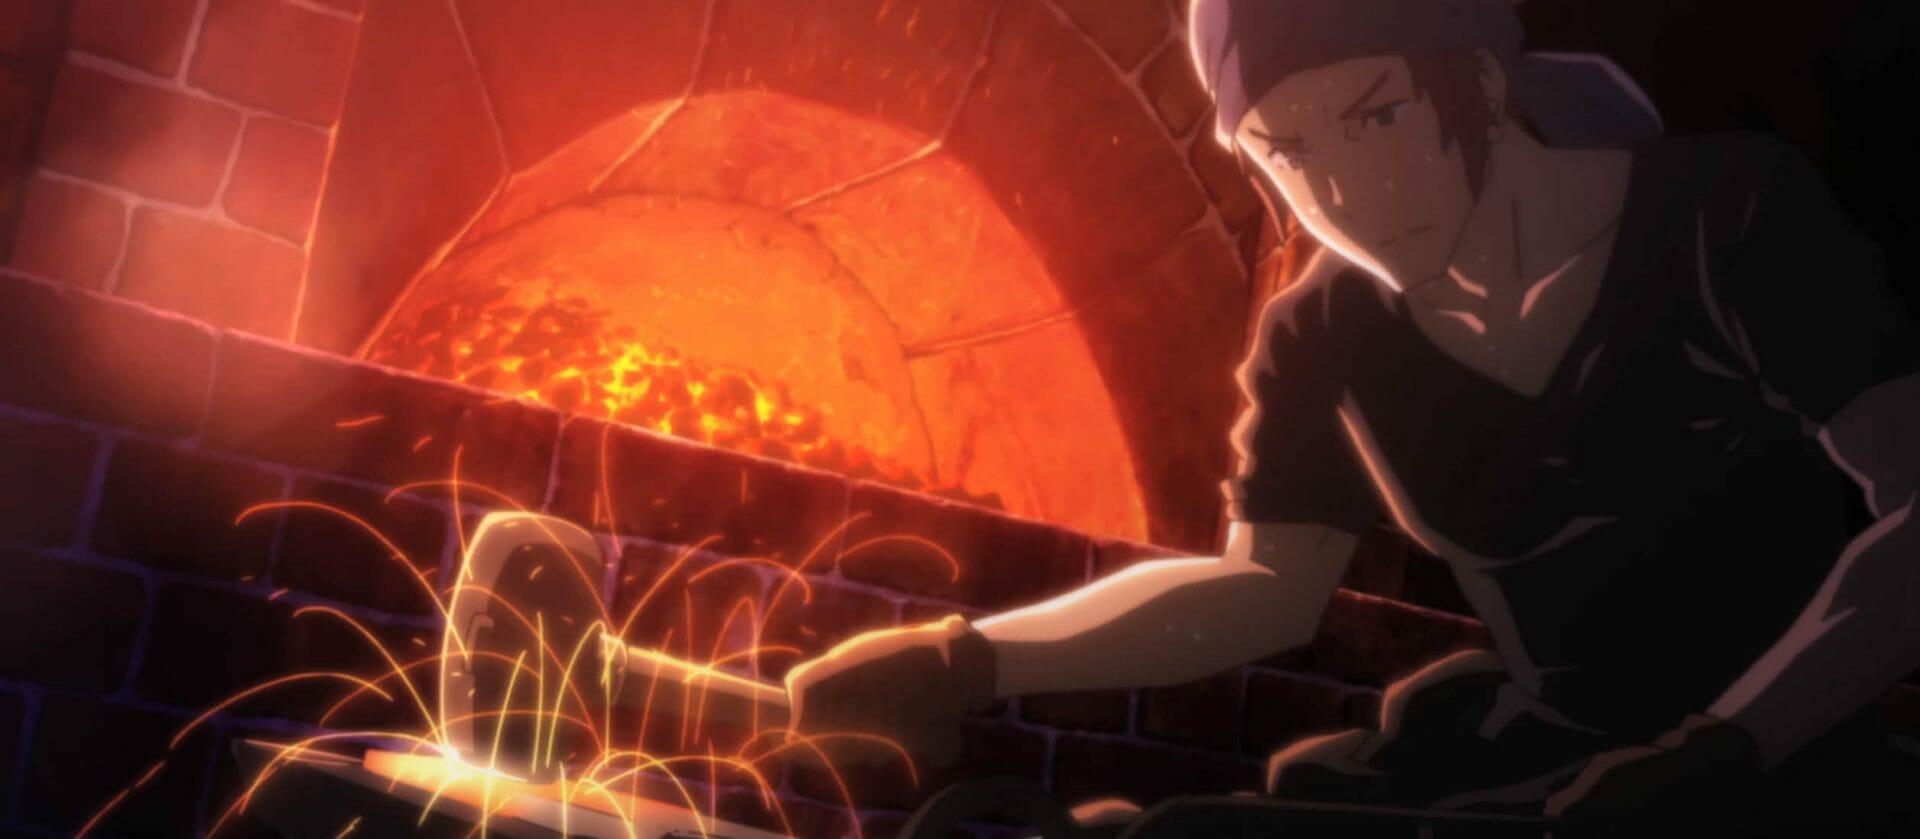 Warrior blacksmith